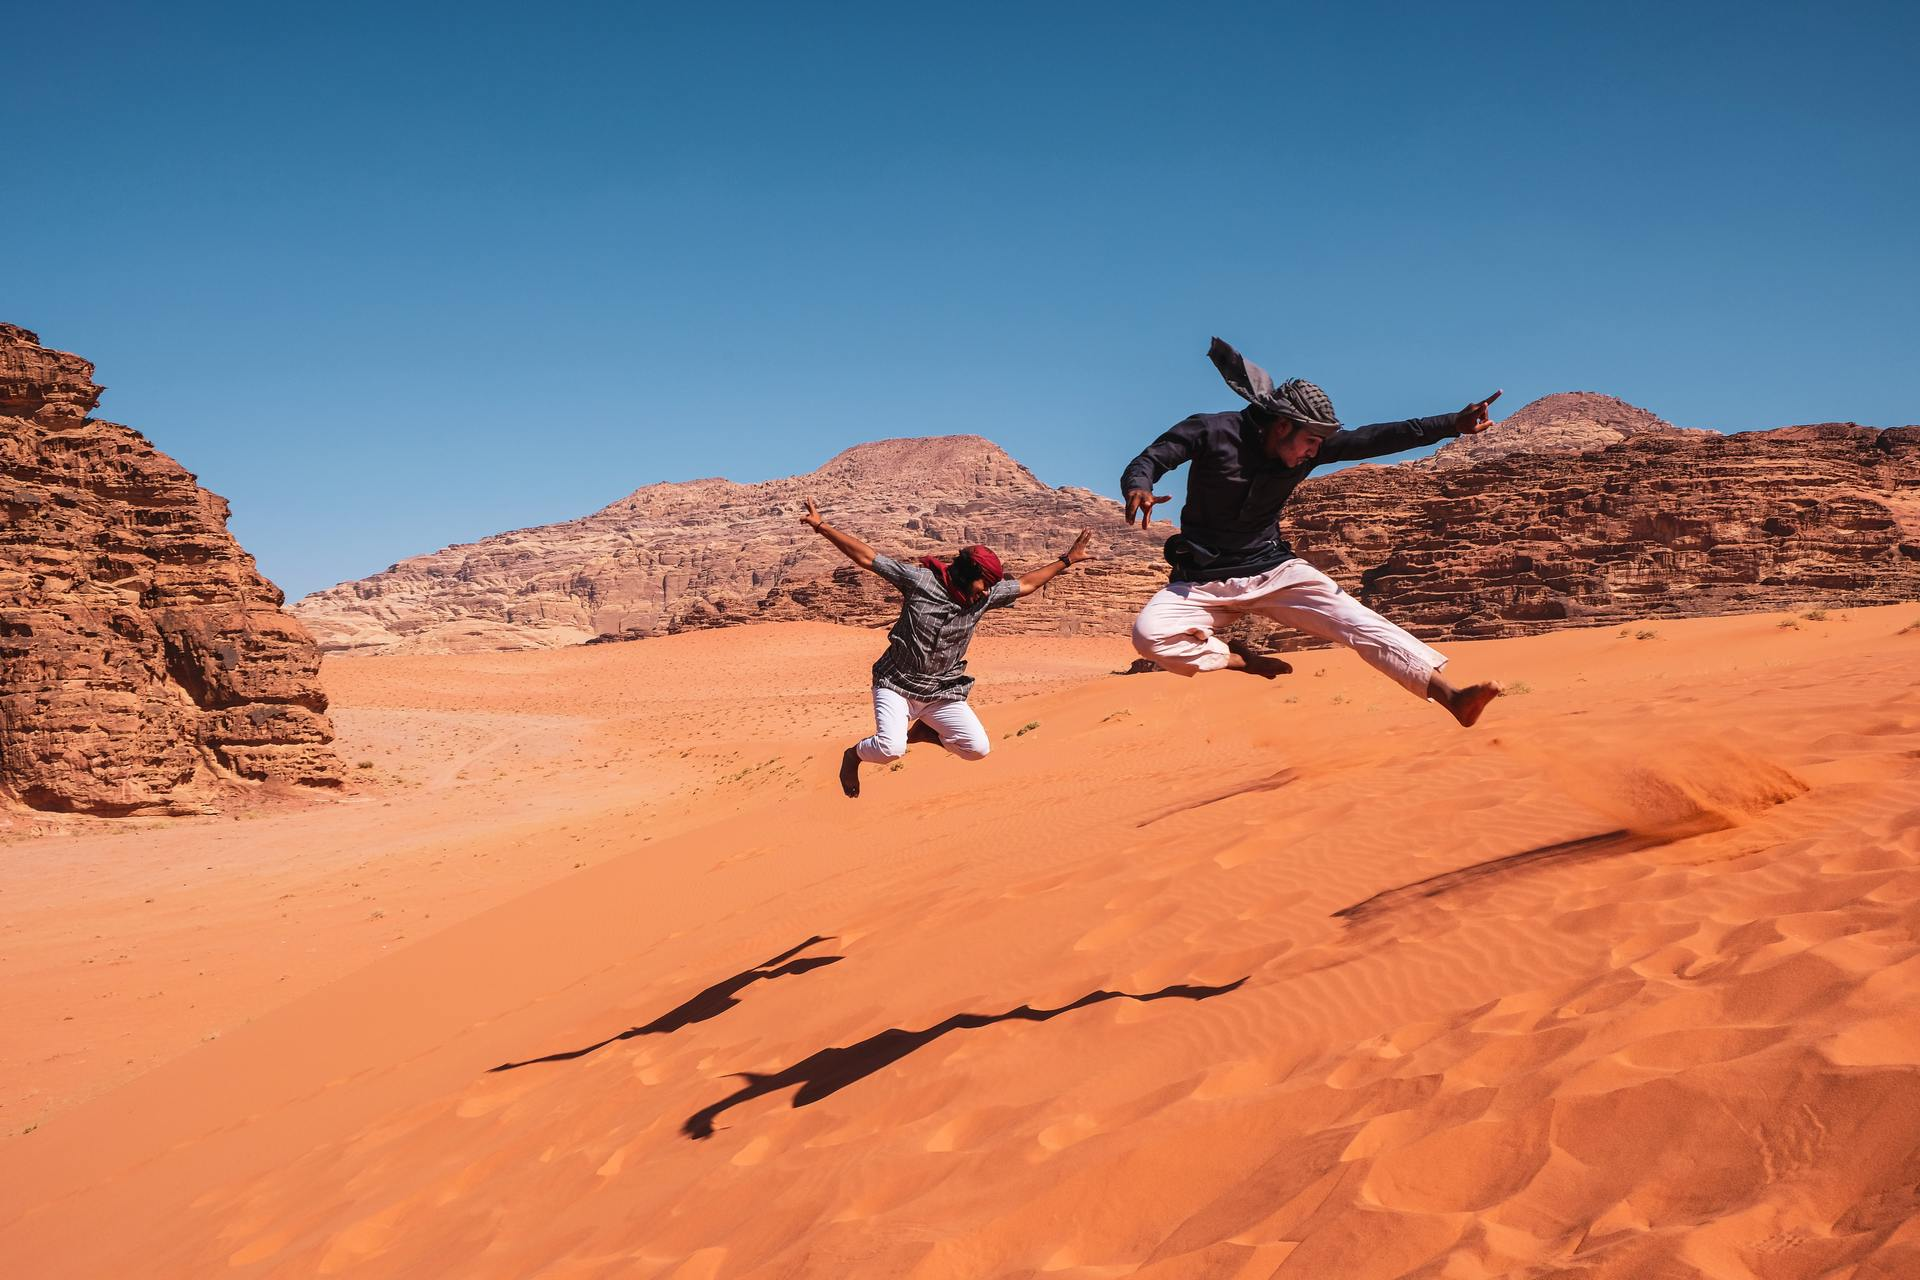 Springen op zandduin, Wadi Rum, Jordanië